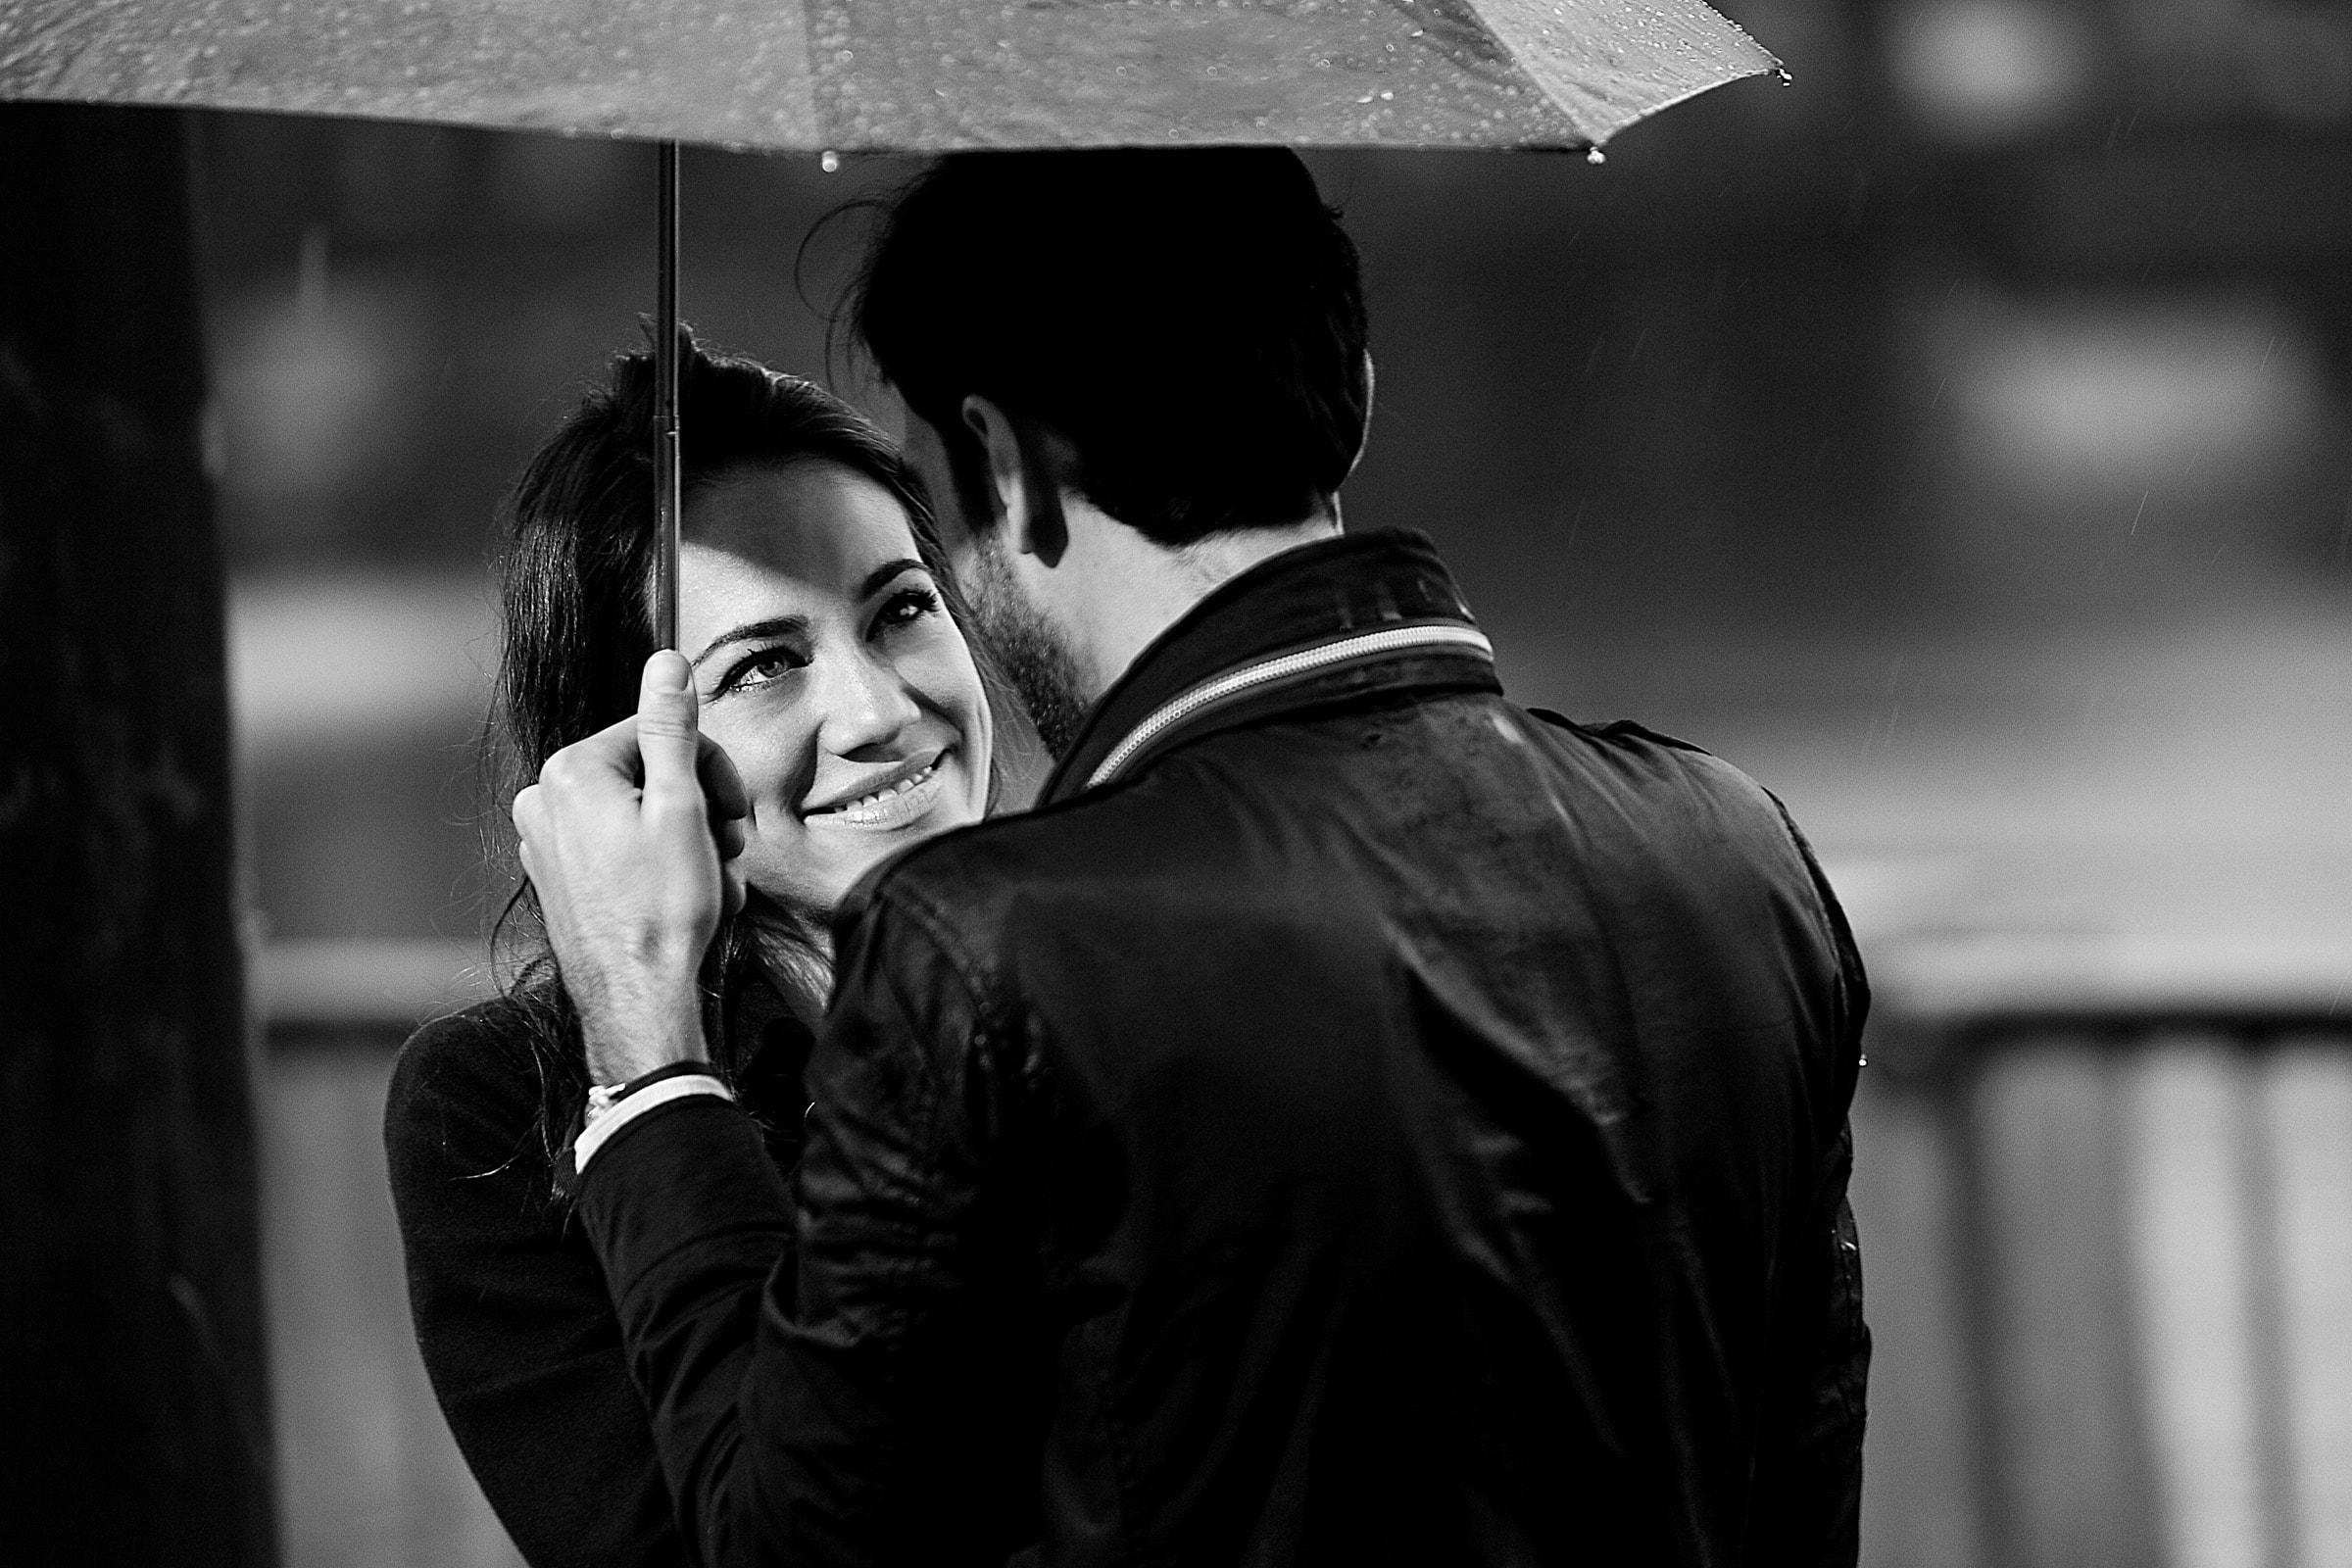 A beautiful Portland engagement proposal photo under an umbrella